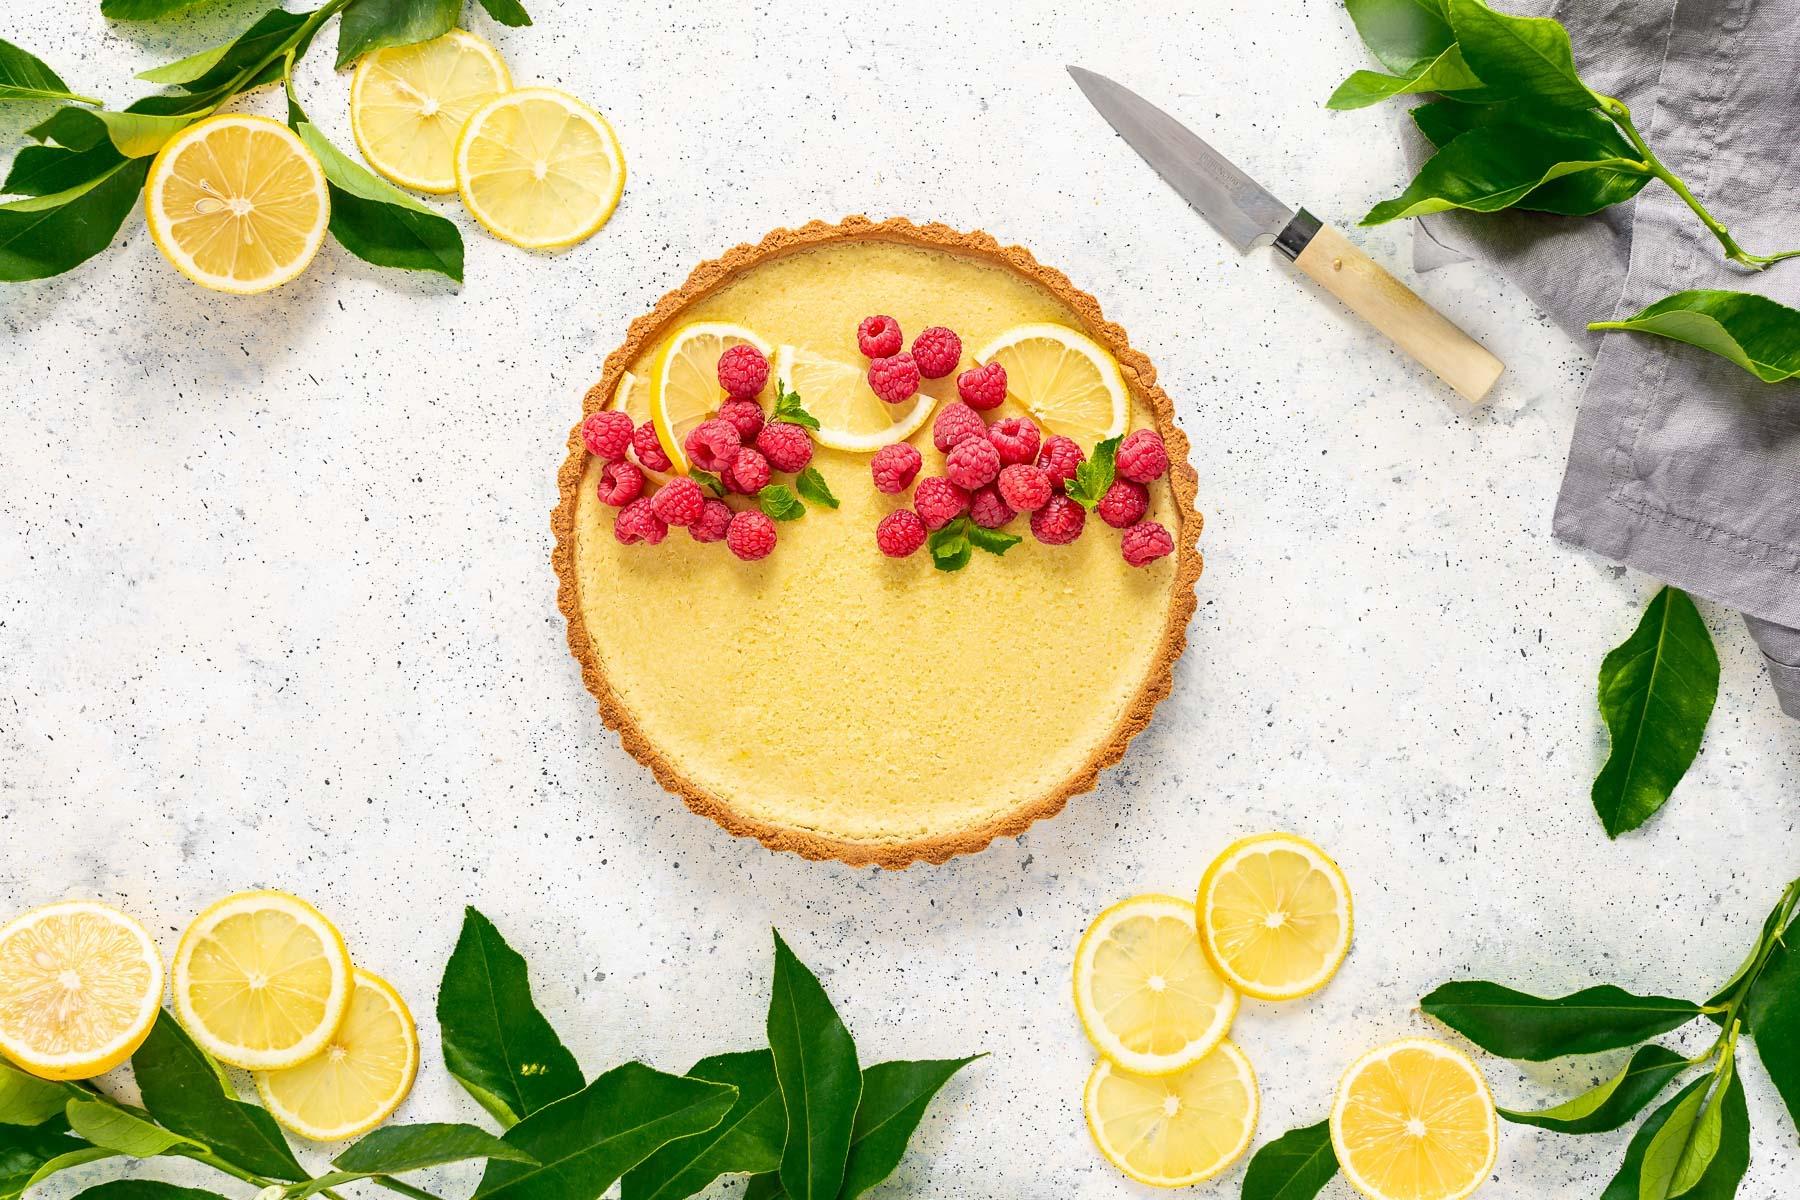 Gluten-Free Vegan Lemon Tart with Almond Crust recipe CROSTATA al LIMONE VEGAN con pasta FROLLA ALLE MANDORLE senza glutine senza zucchero raffinato